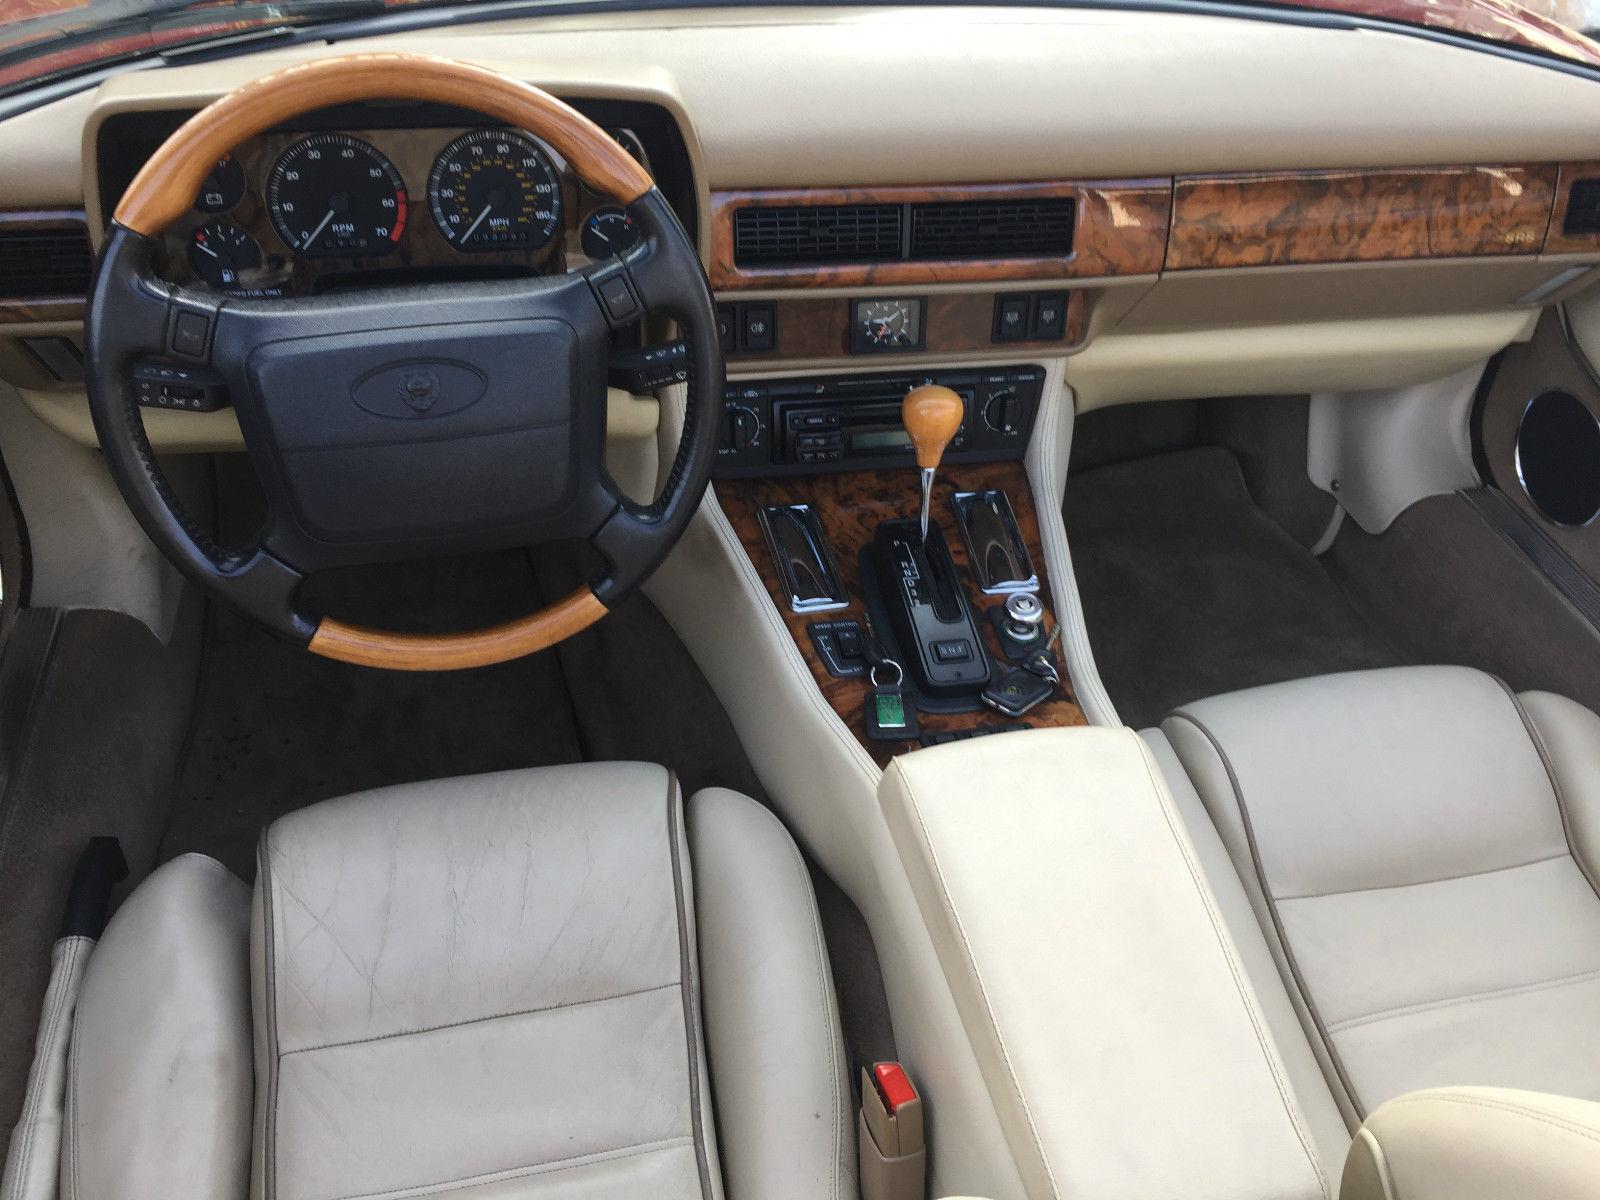 1996 Jaguar XJS Convertible interior